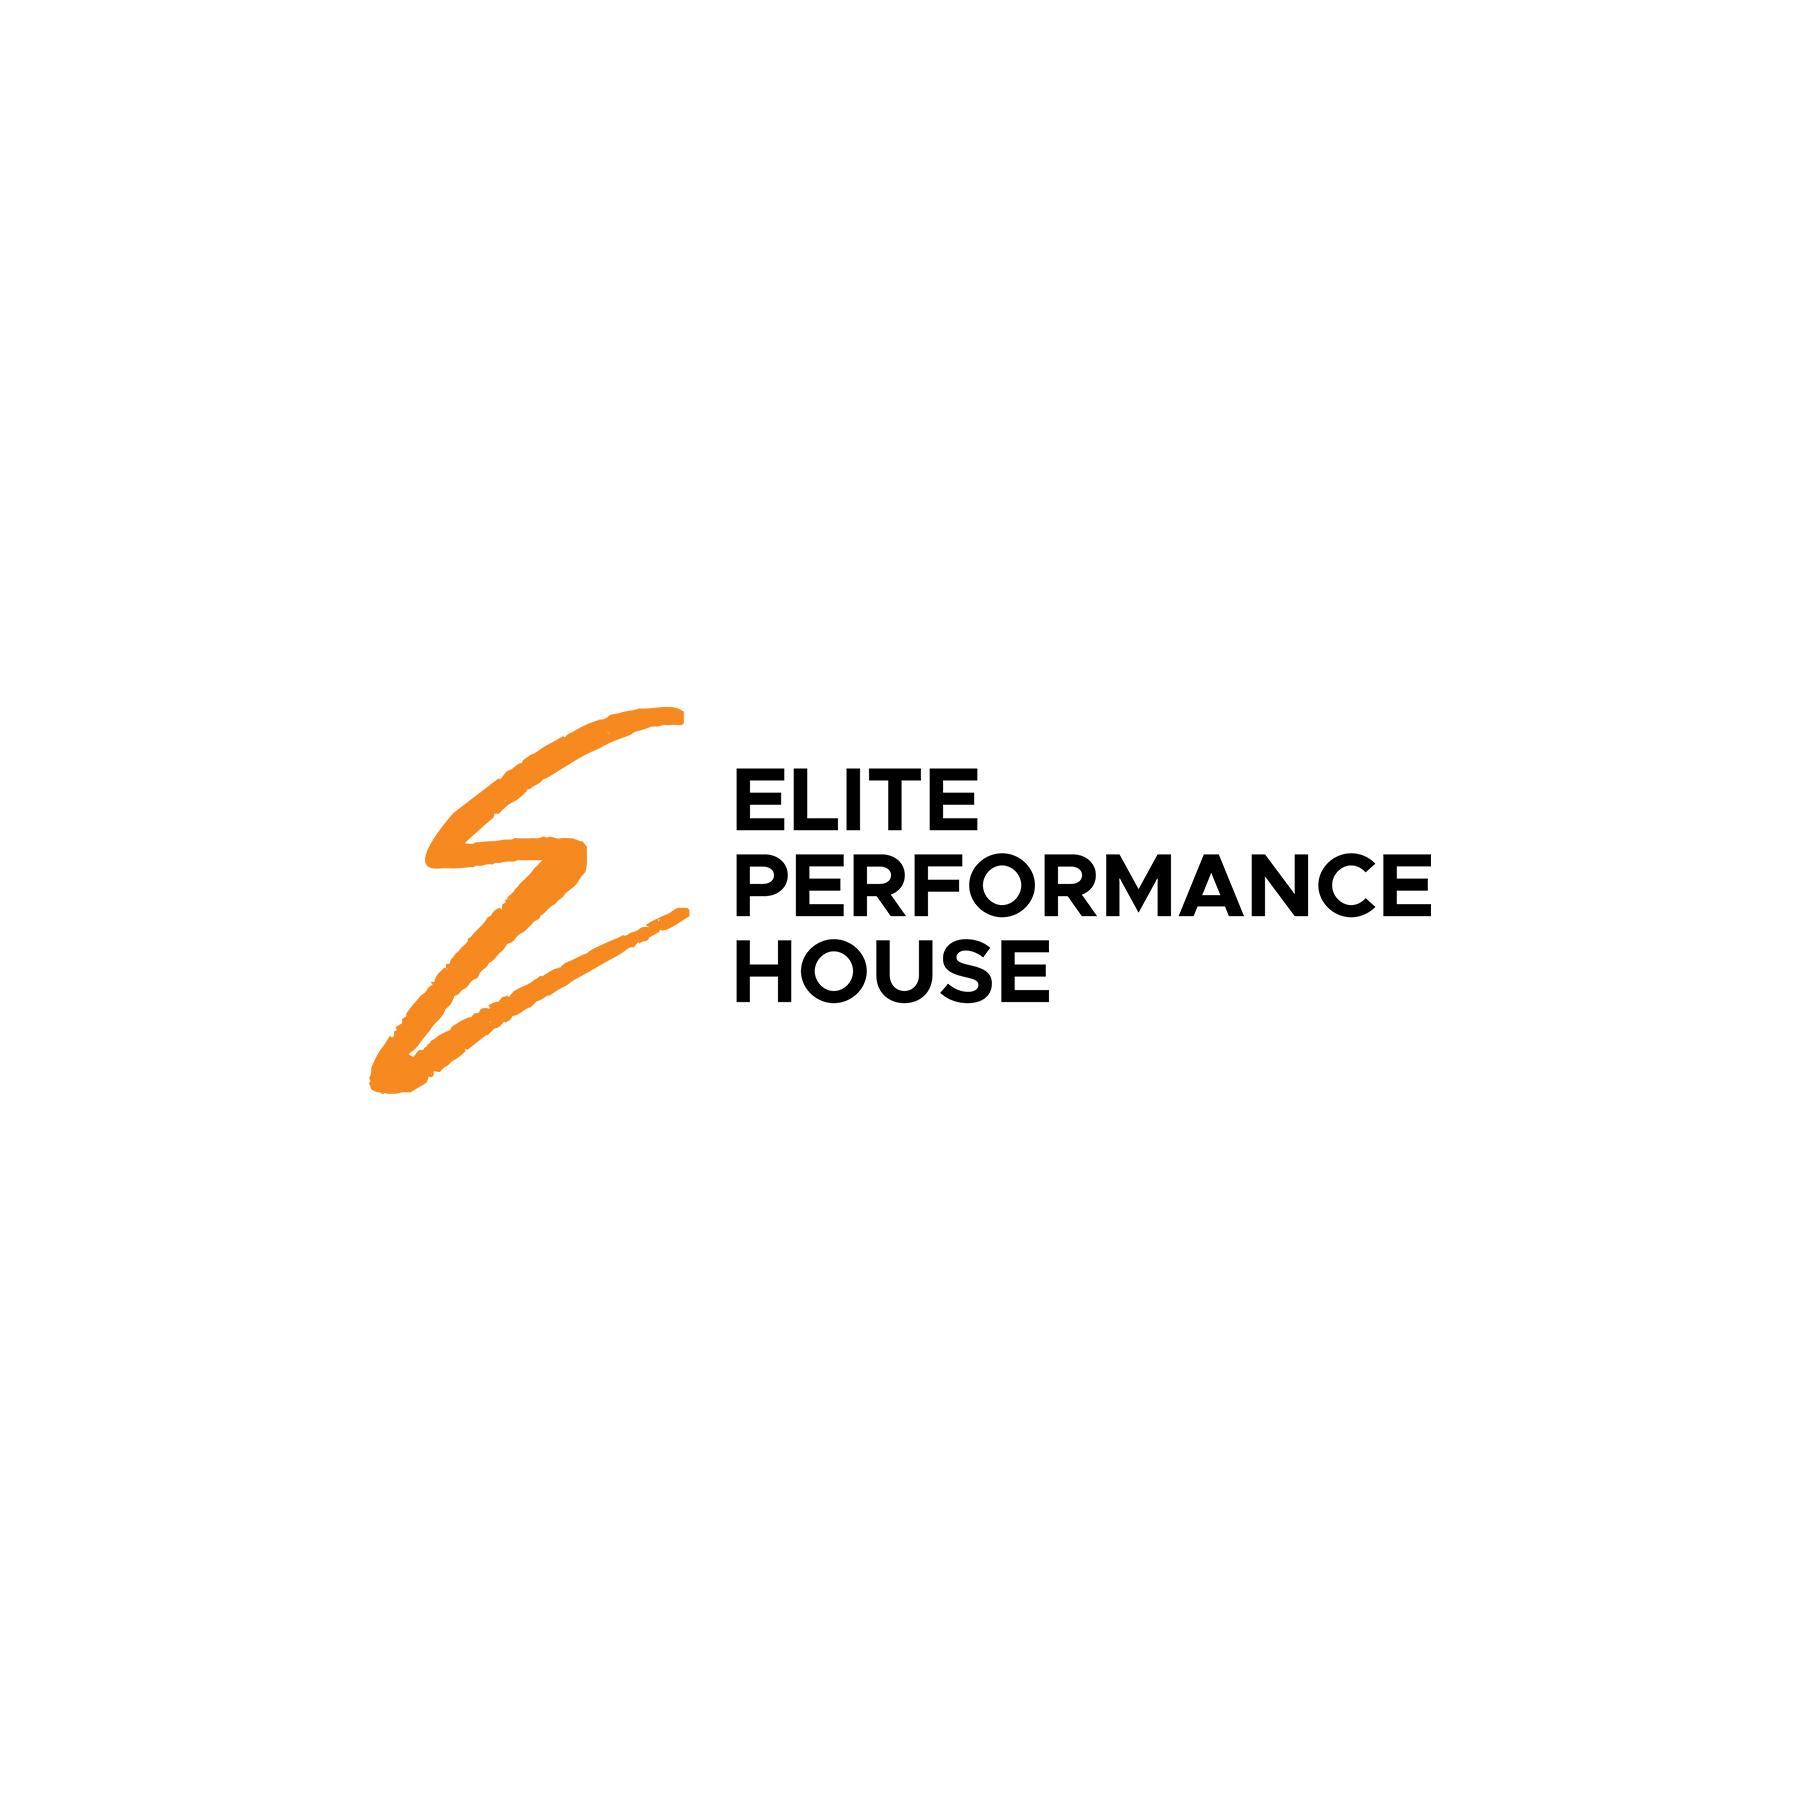 elite performance house